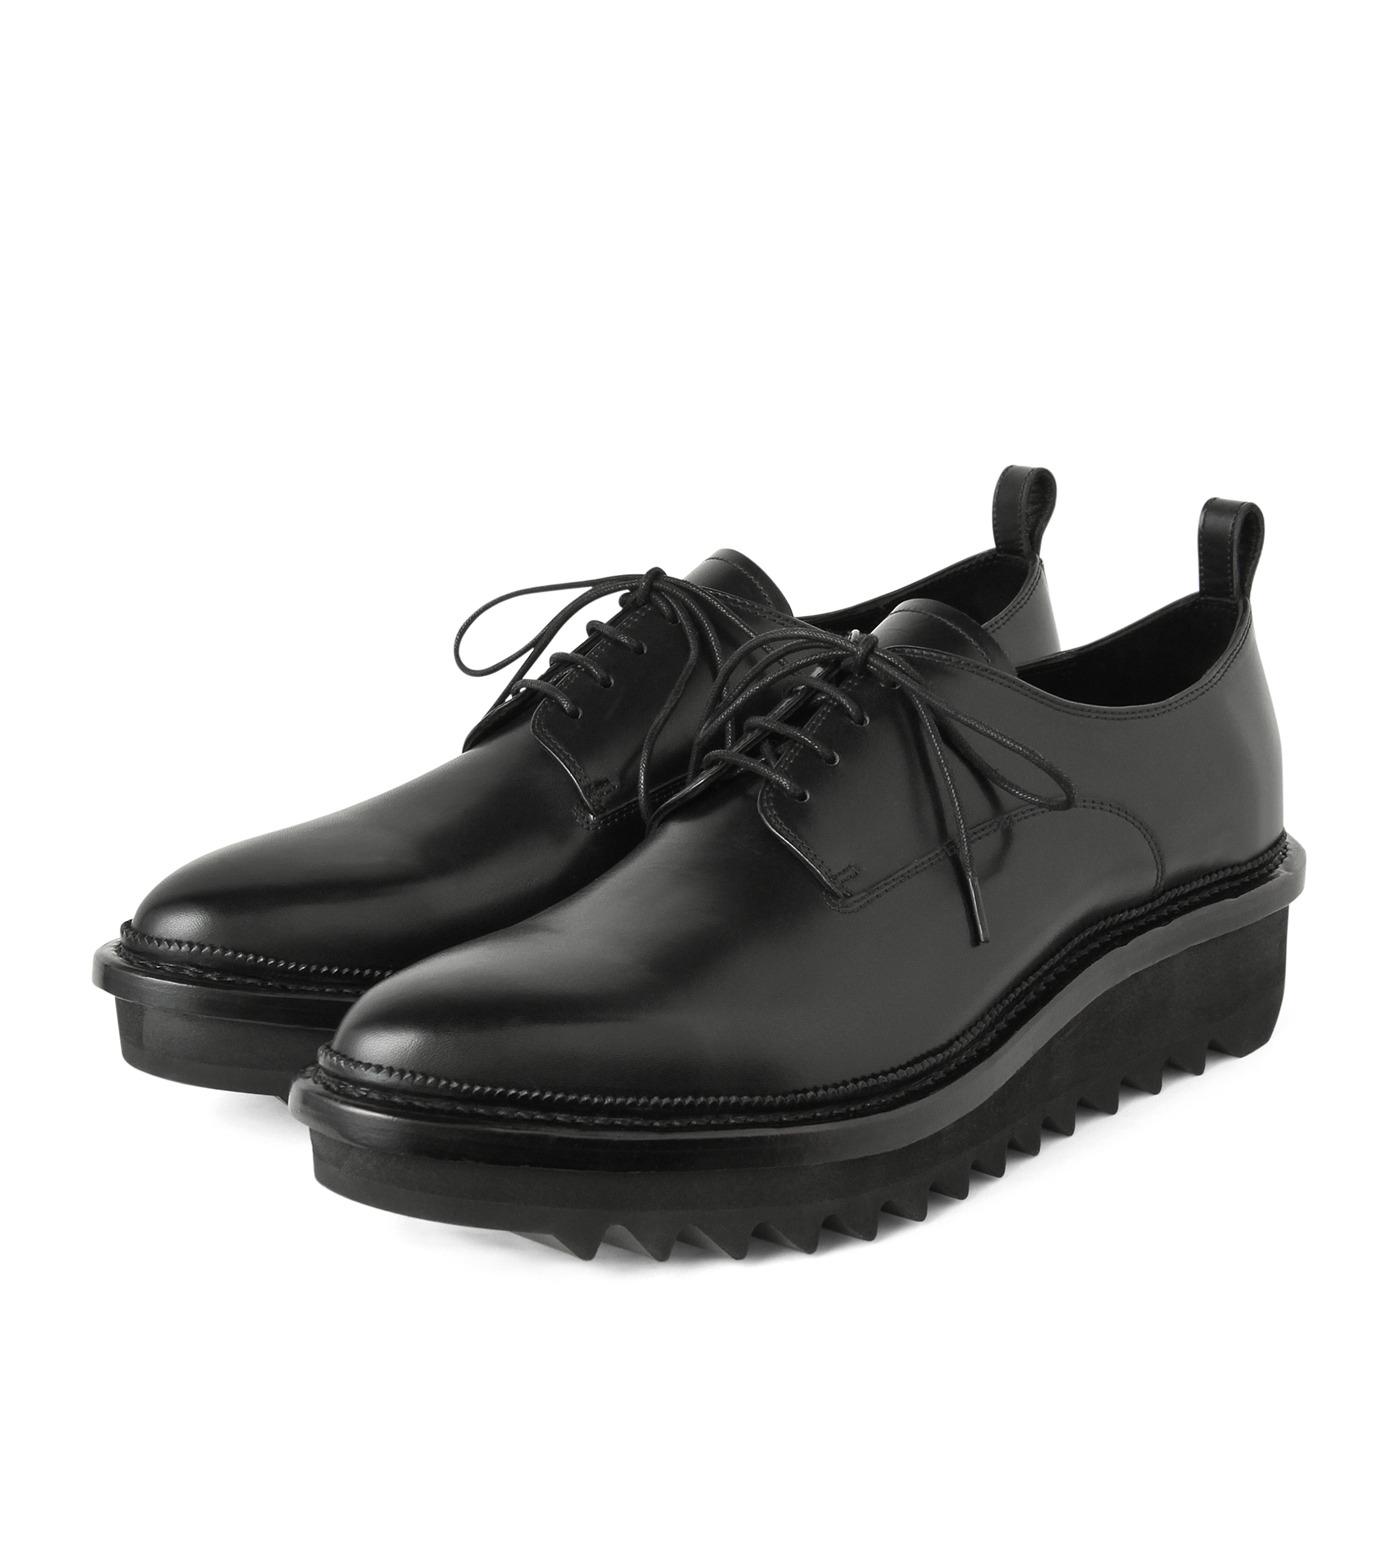 HL HEDDIE LOVU(エイチエル・エディールーヴ)のSHIRKSOLE SHOES-BLACK(シューズ/shoes)-18S90001-13 拡大詳細画像3